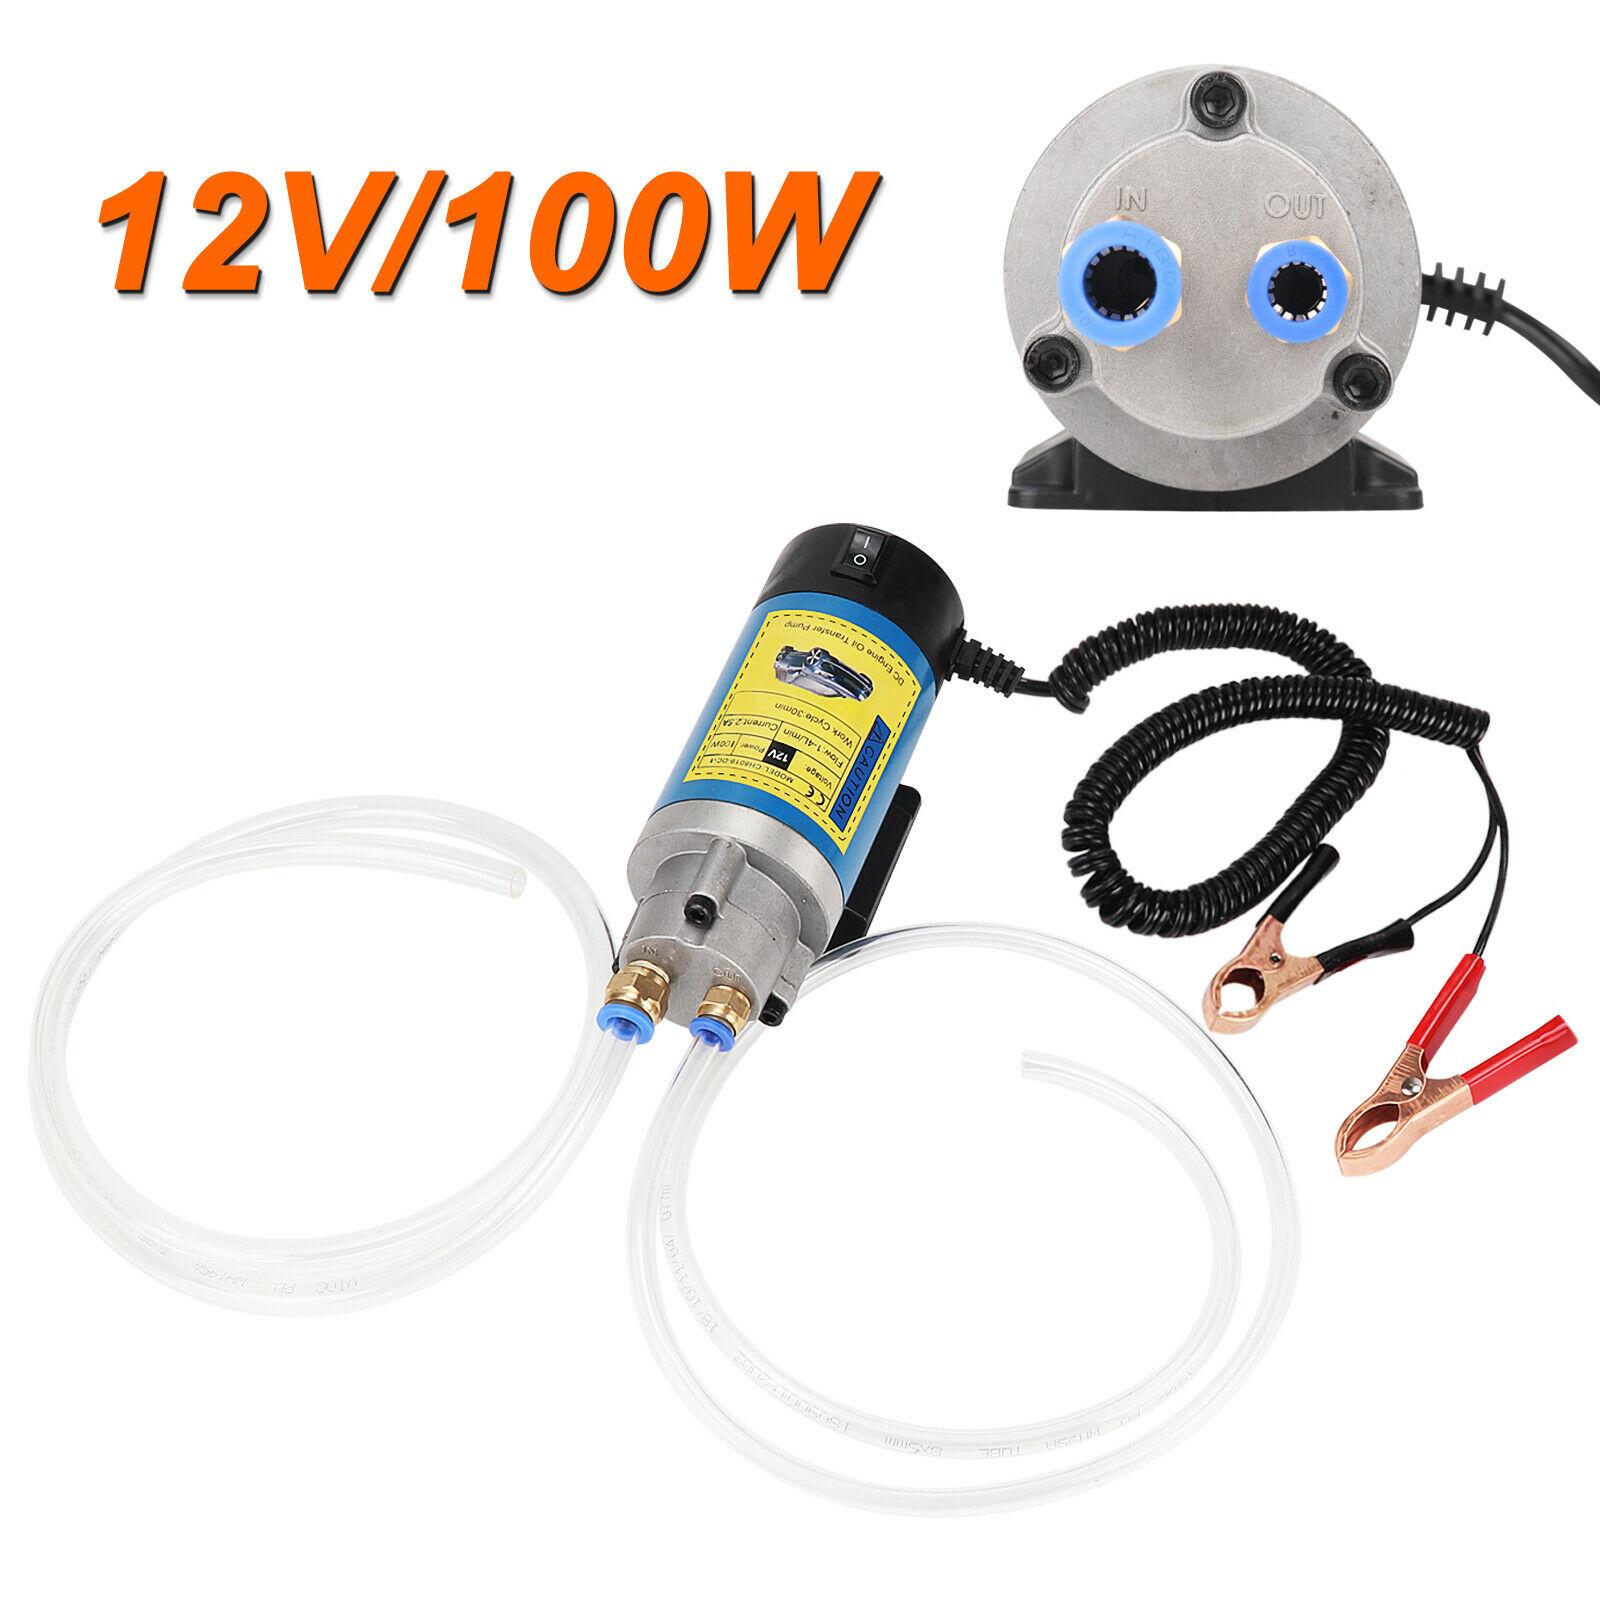 100 w 12 v 전기 오일 전송 추출기 유체 디젤 펌프 사이펀 자동차 오토바이